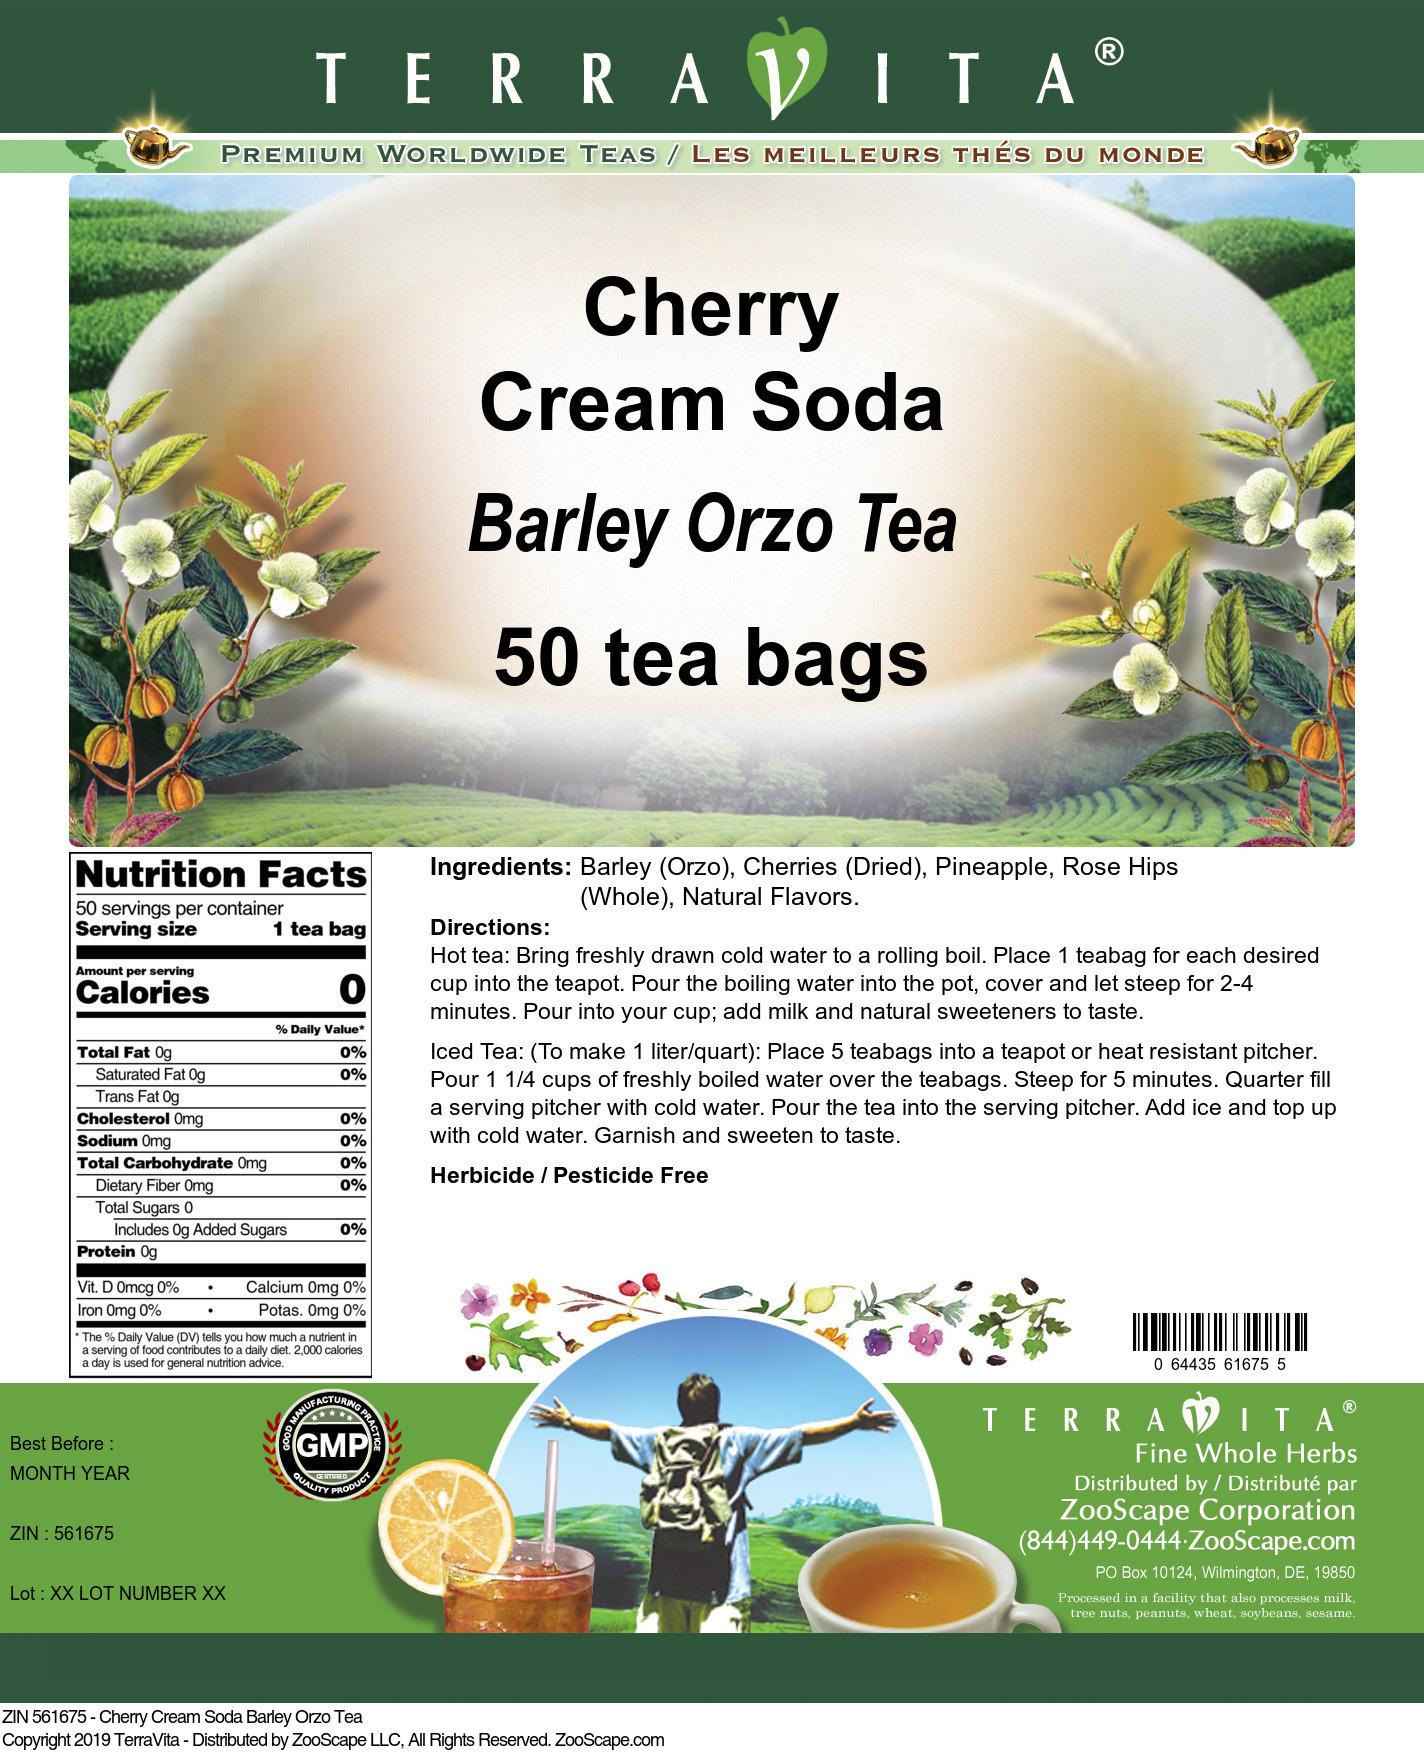 Cherry Cream Soda Barley Orzo